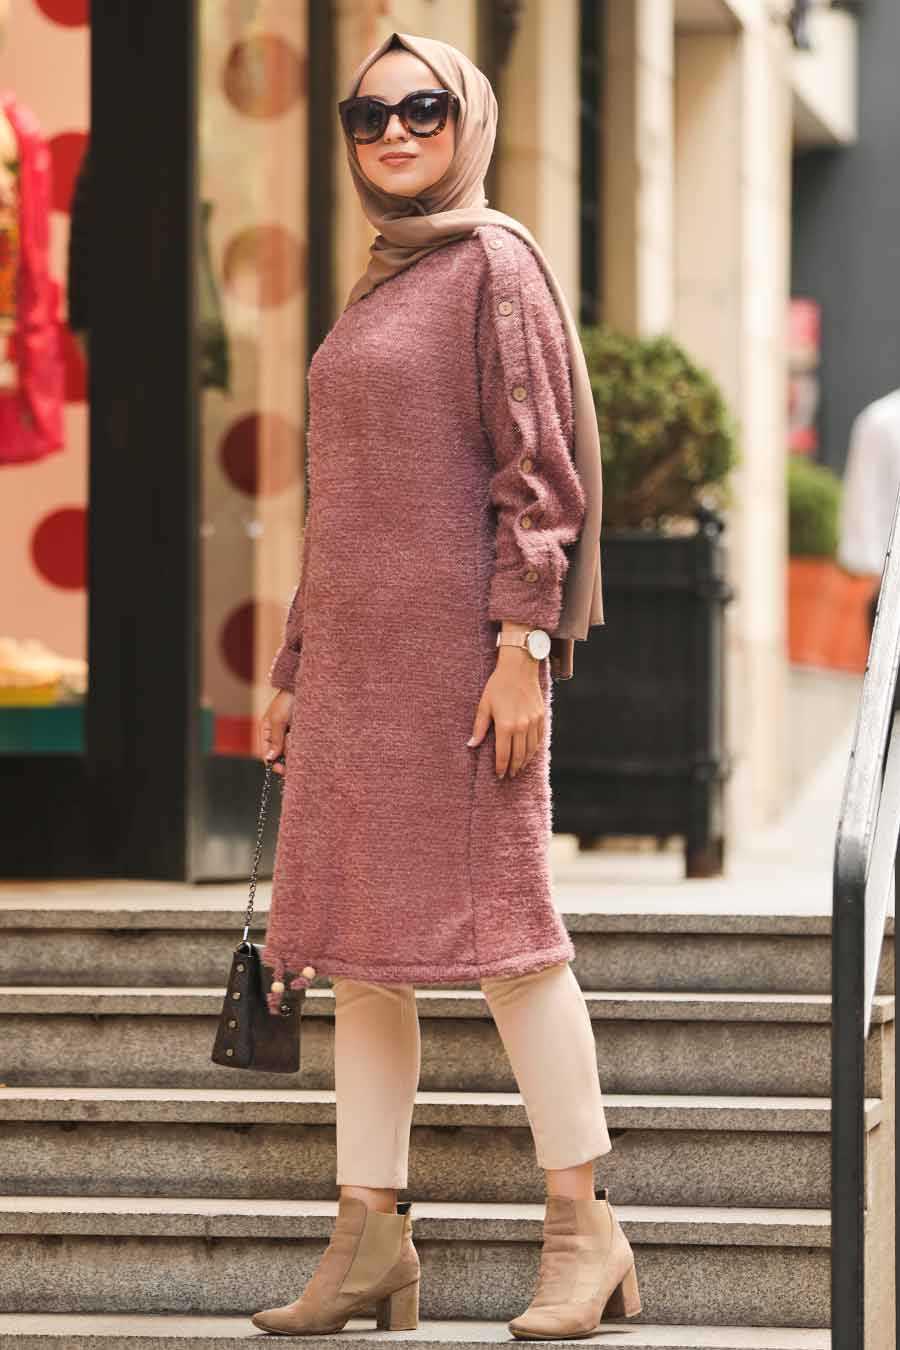 Dusty Rose Hijab Tunic 5968GK